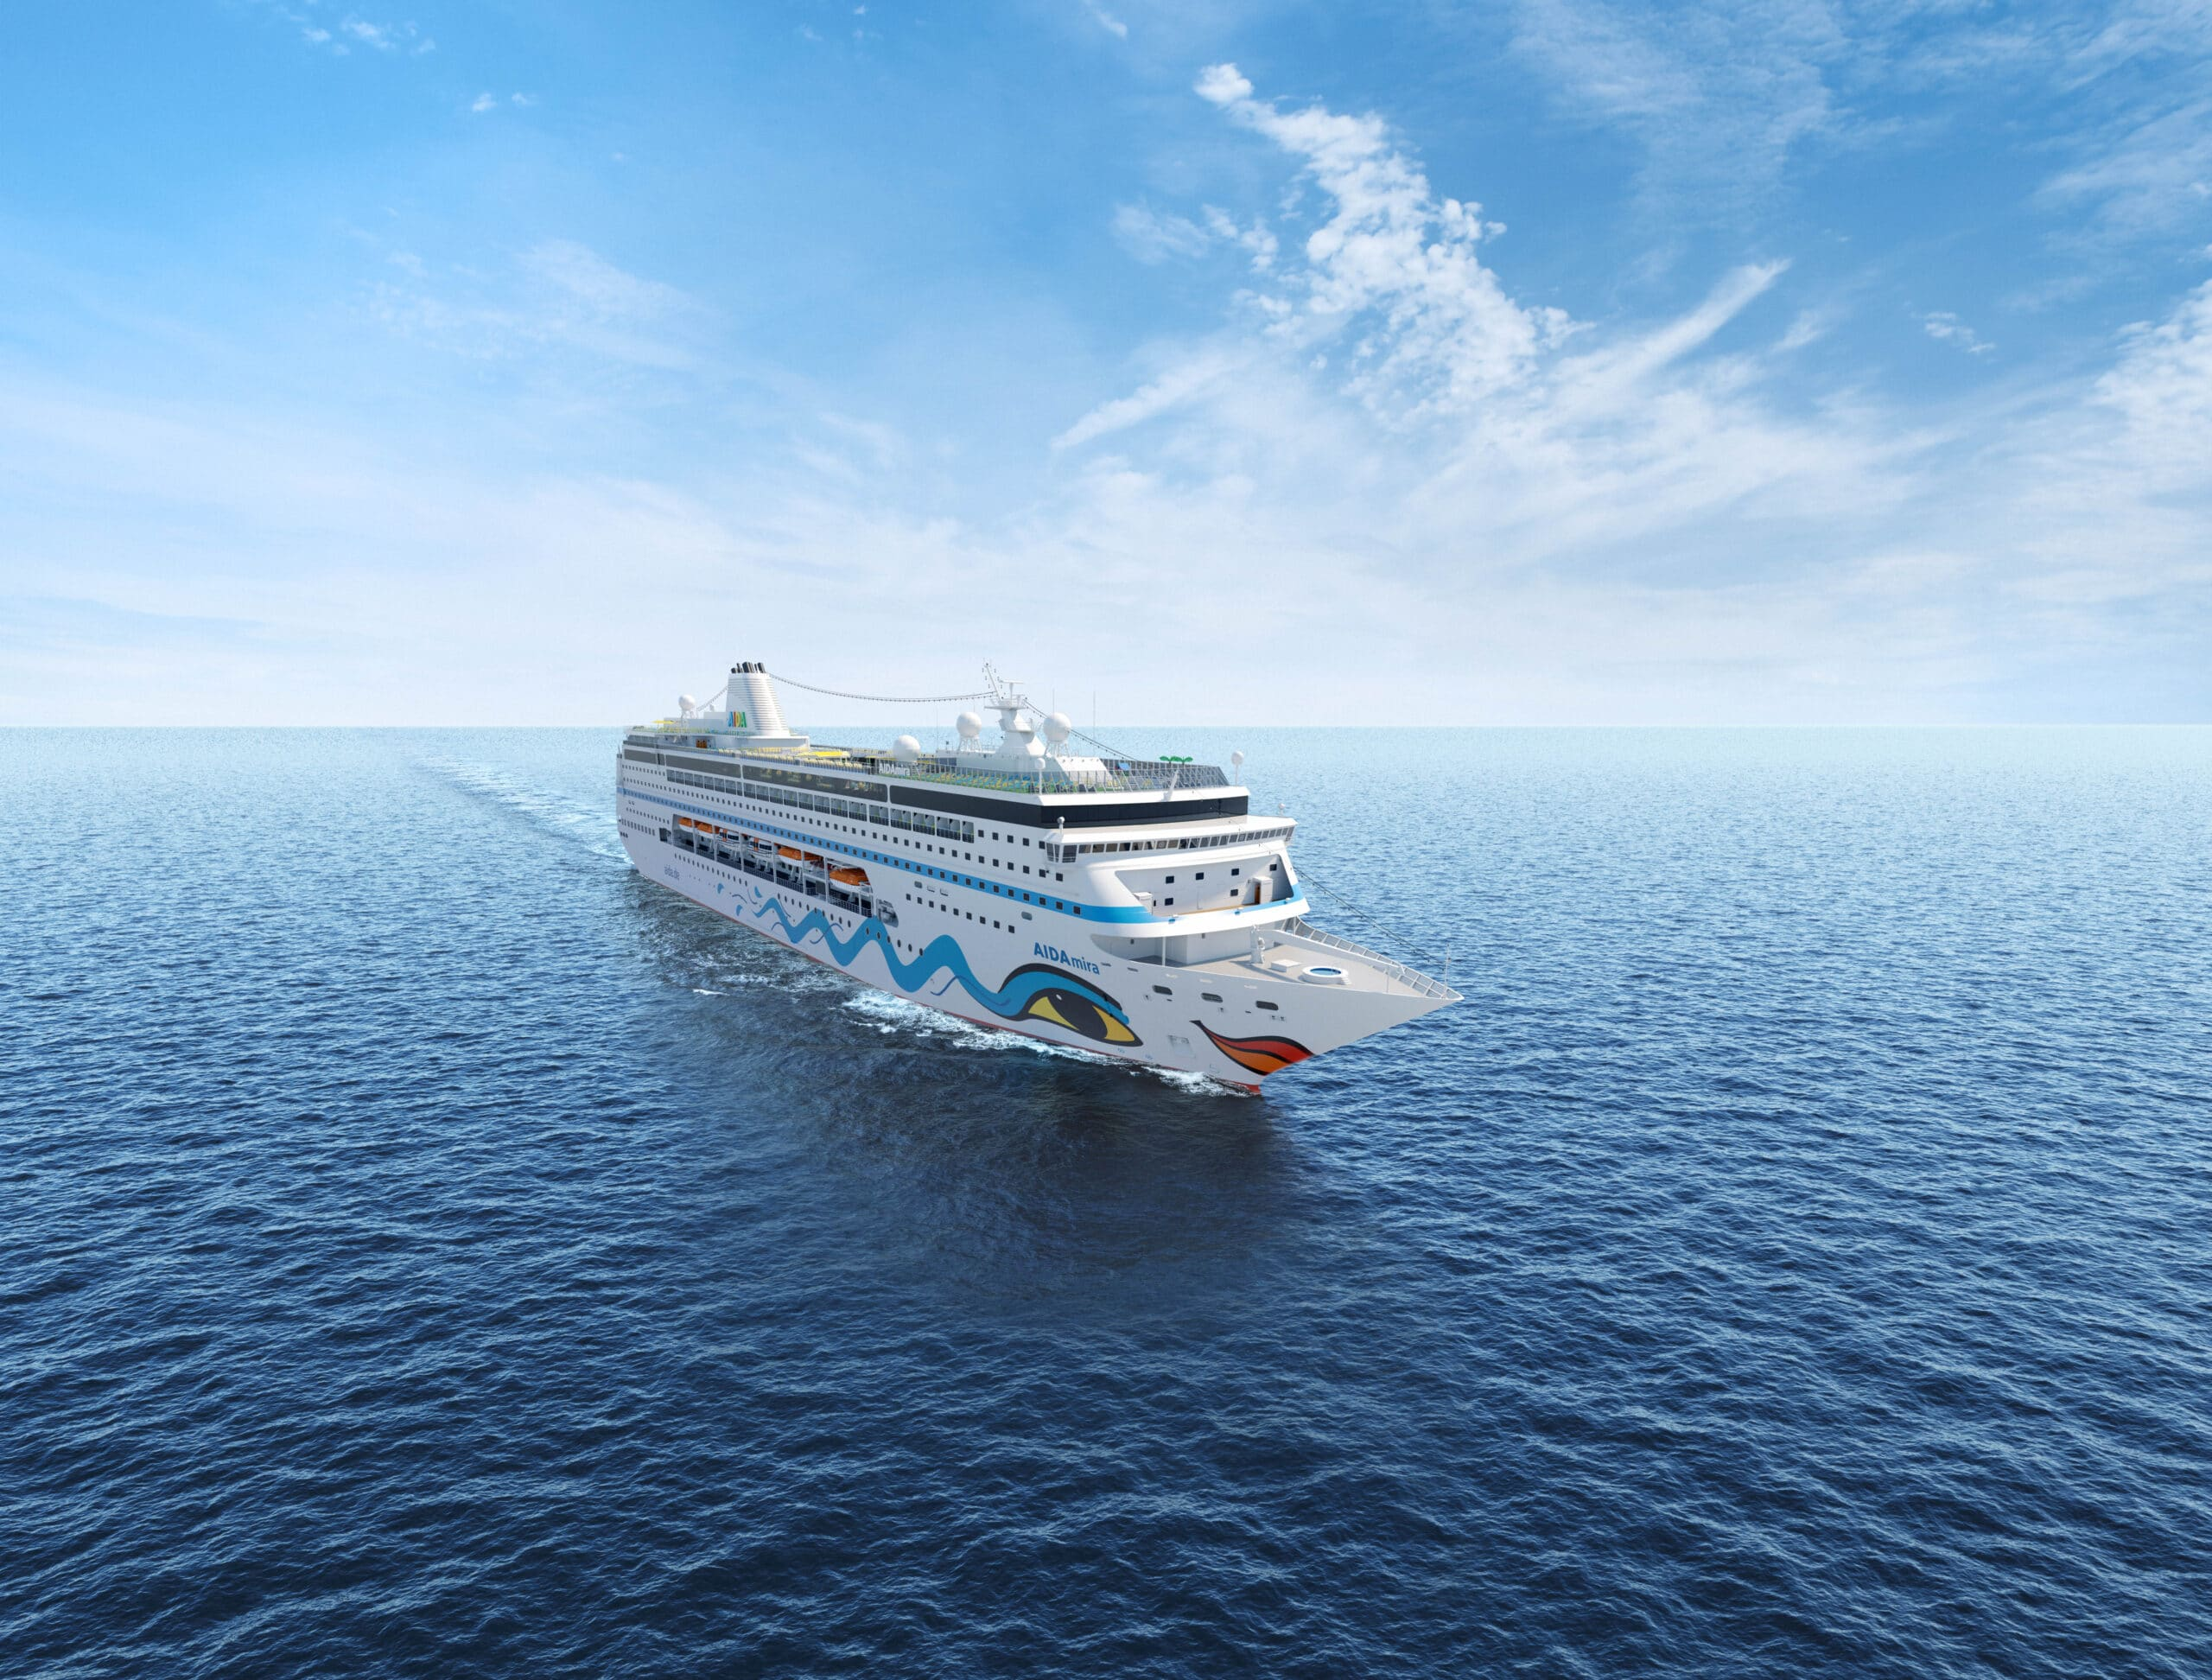 Cruiseschip-AIDAmira-AIDA-Schip